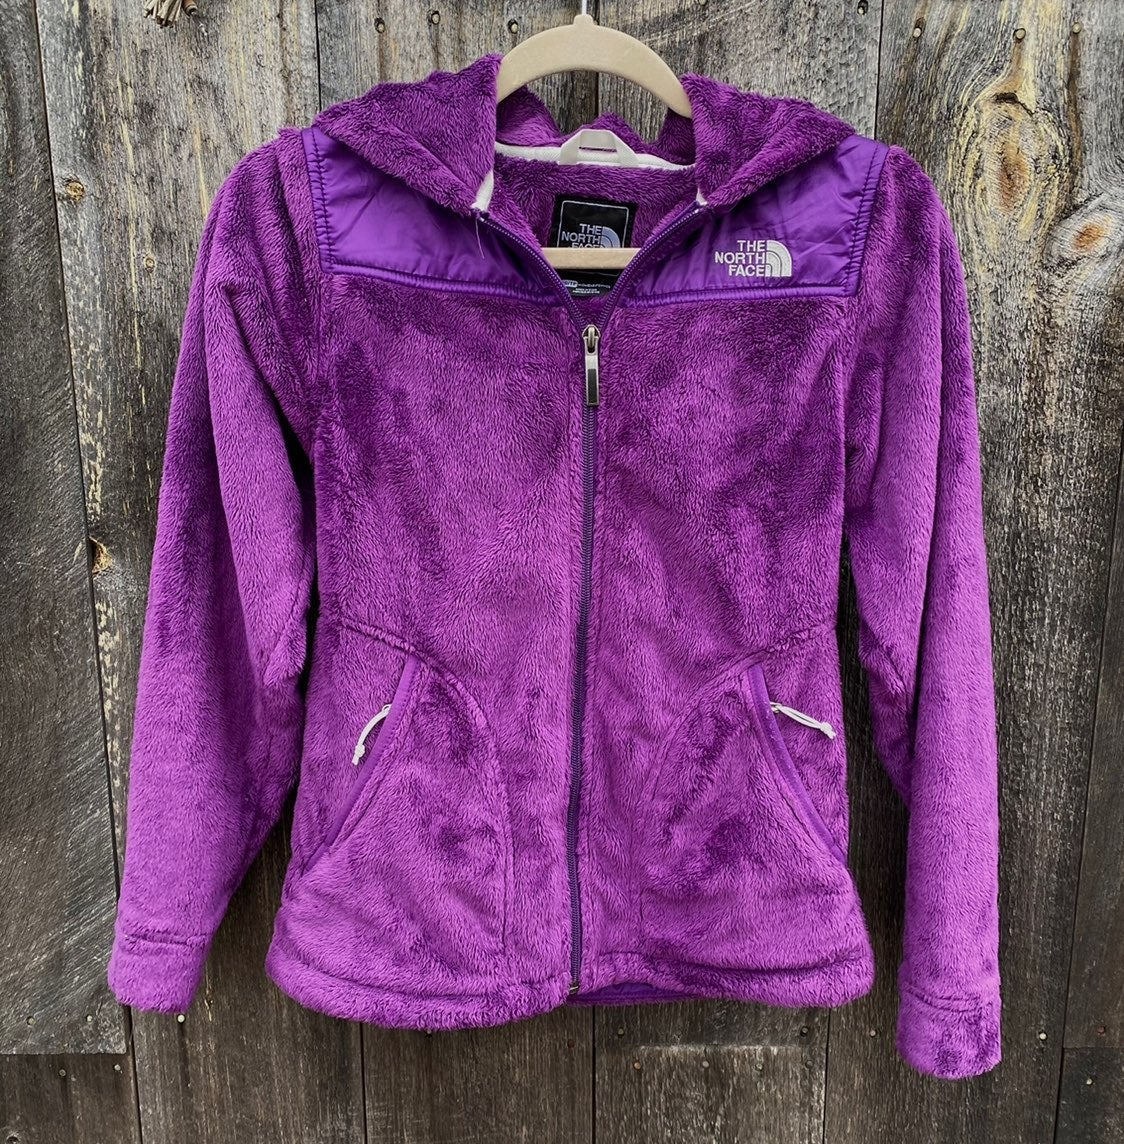 The northface purple jacket